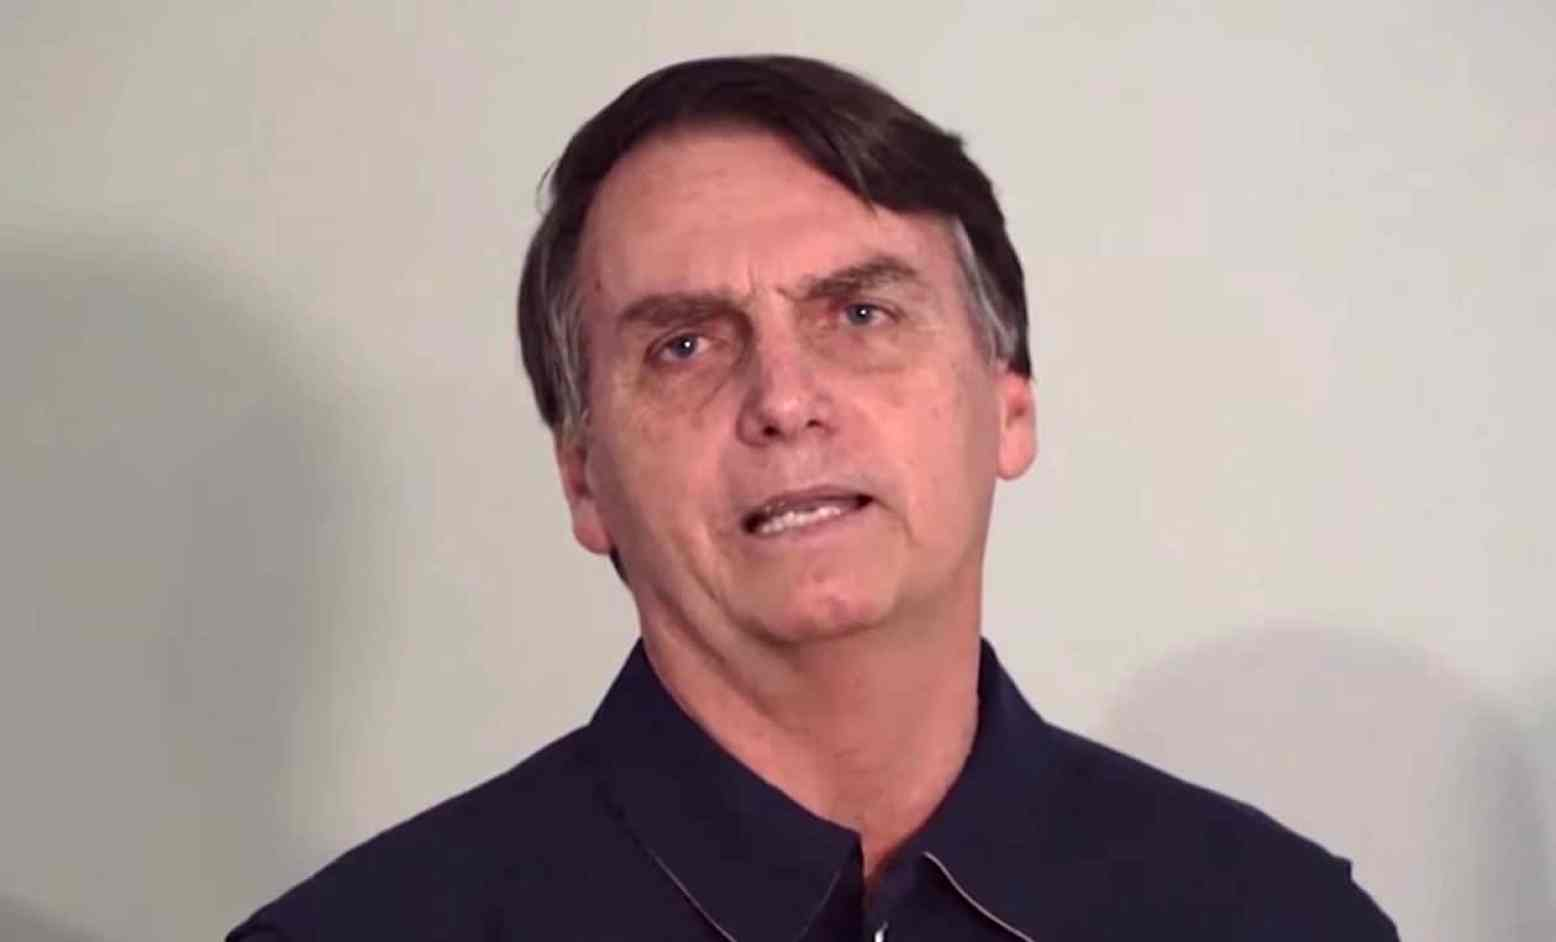 jair bolsonaro brazils trump